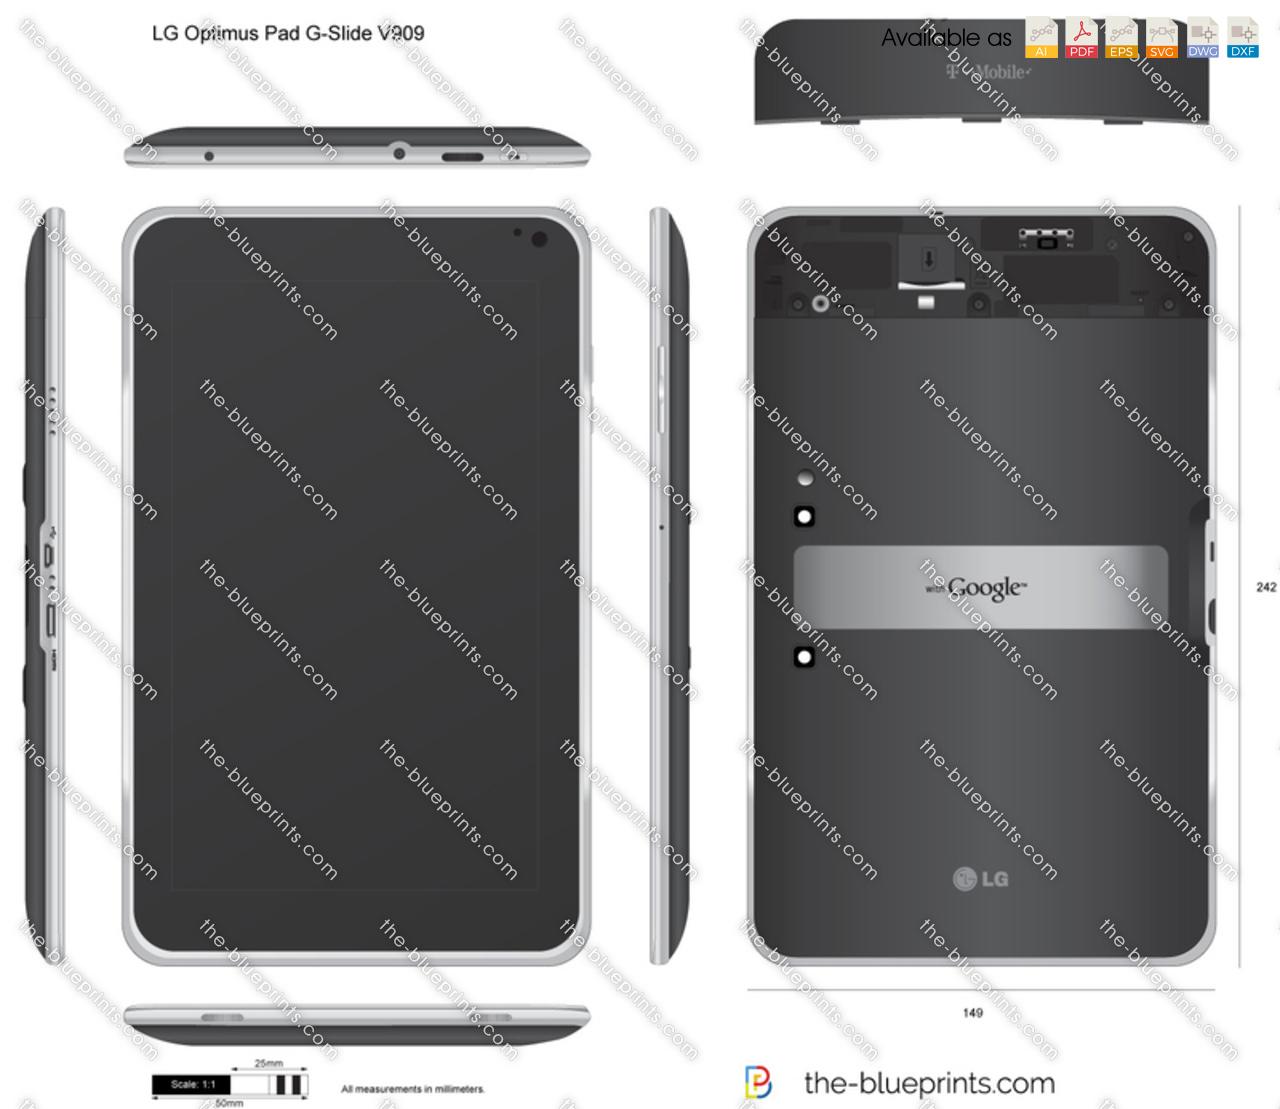 LG Optimus Pad G-Slide V909